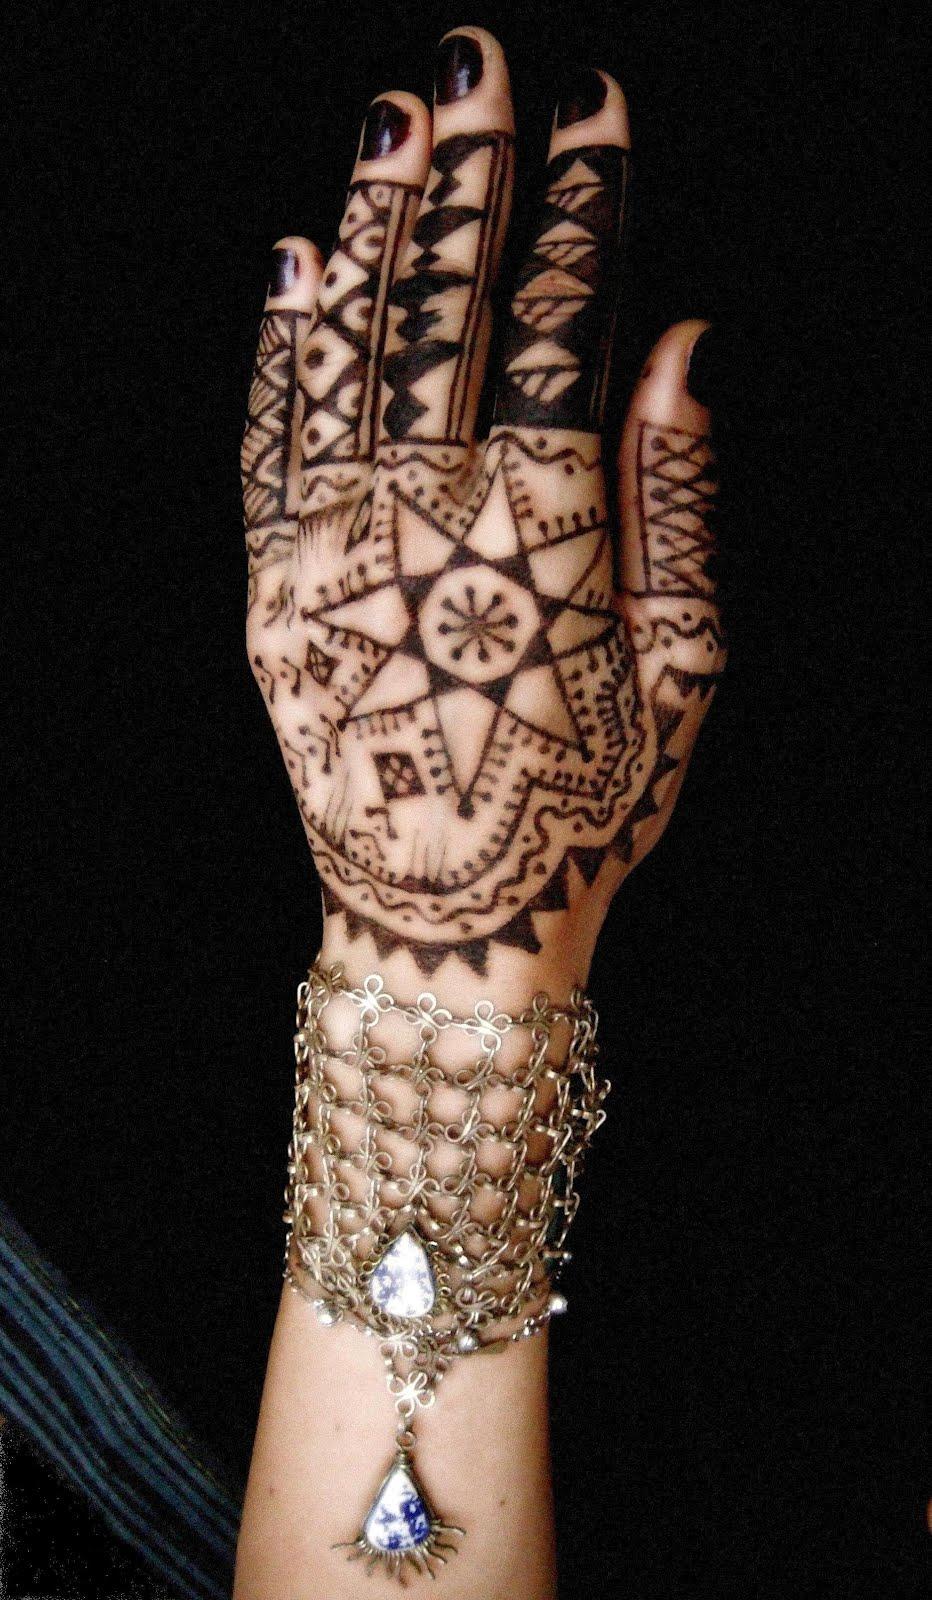 Henna Tattoo & Mehendi